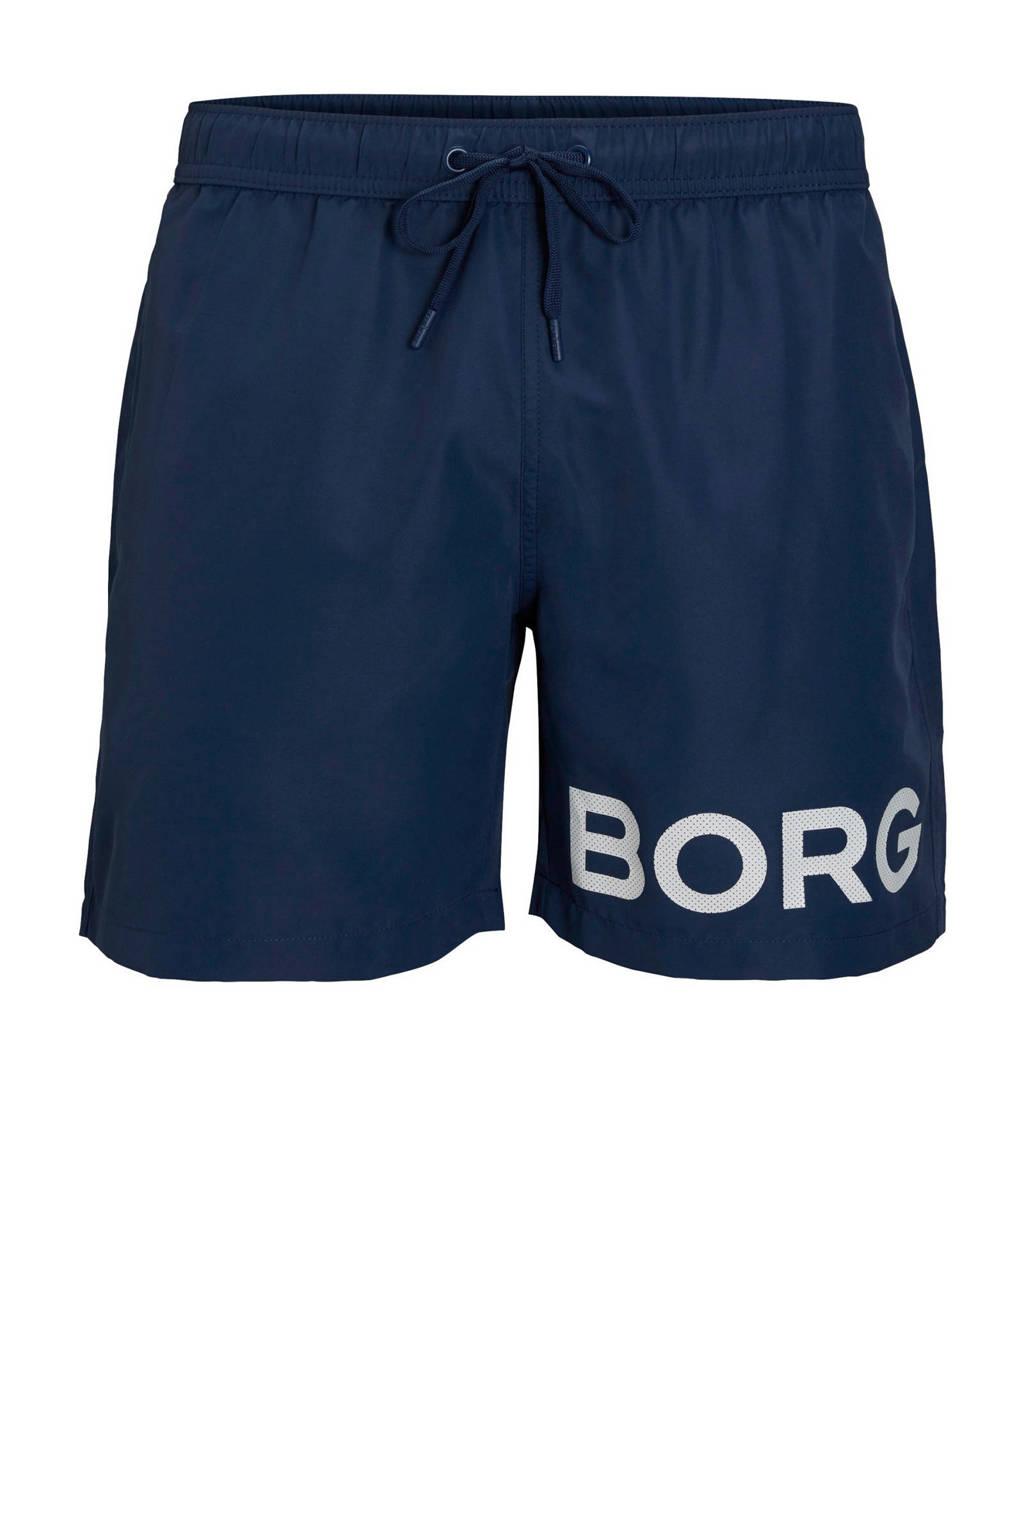 Björn Borg zwemshort met logo marine, Marine